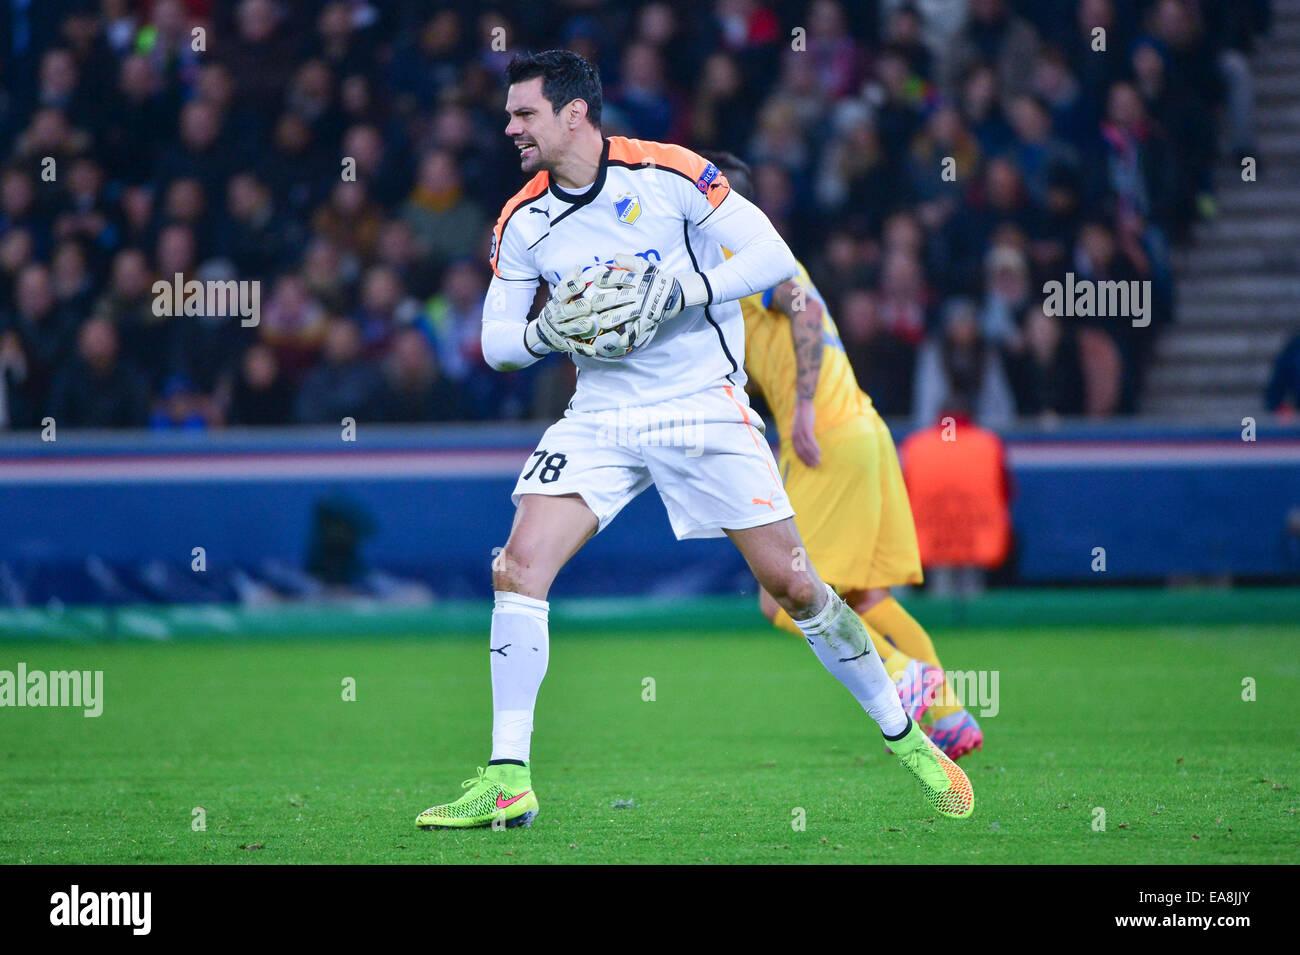 Urko PARDO - 05.11.2014 - Paris Saint Germain/Apoel Nicosie - Champions League Photo : Winterpress/Icon Sportw - Stock Image